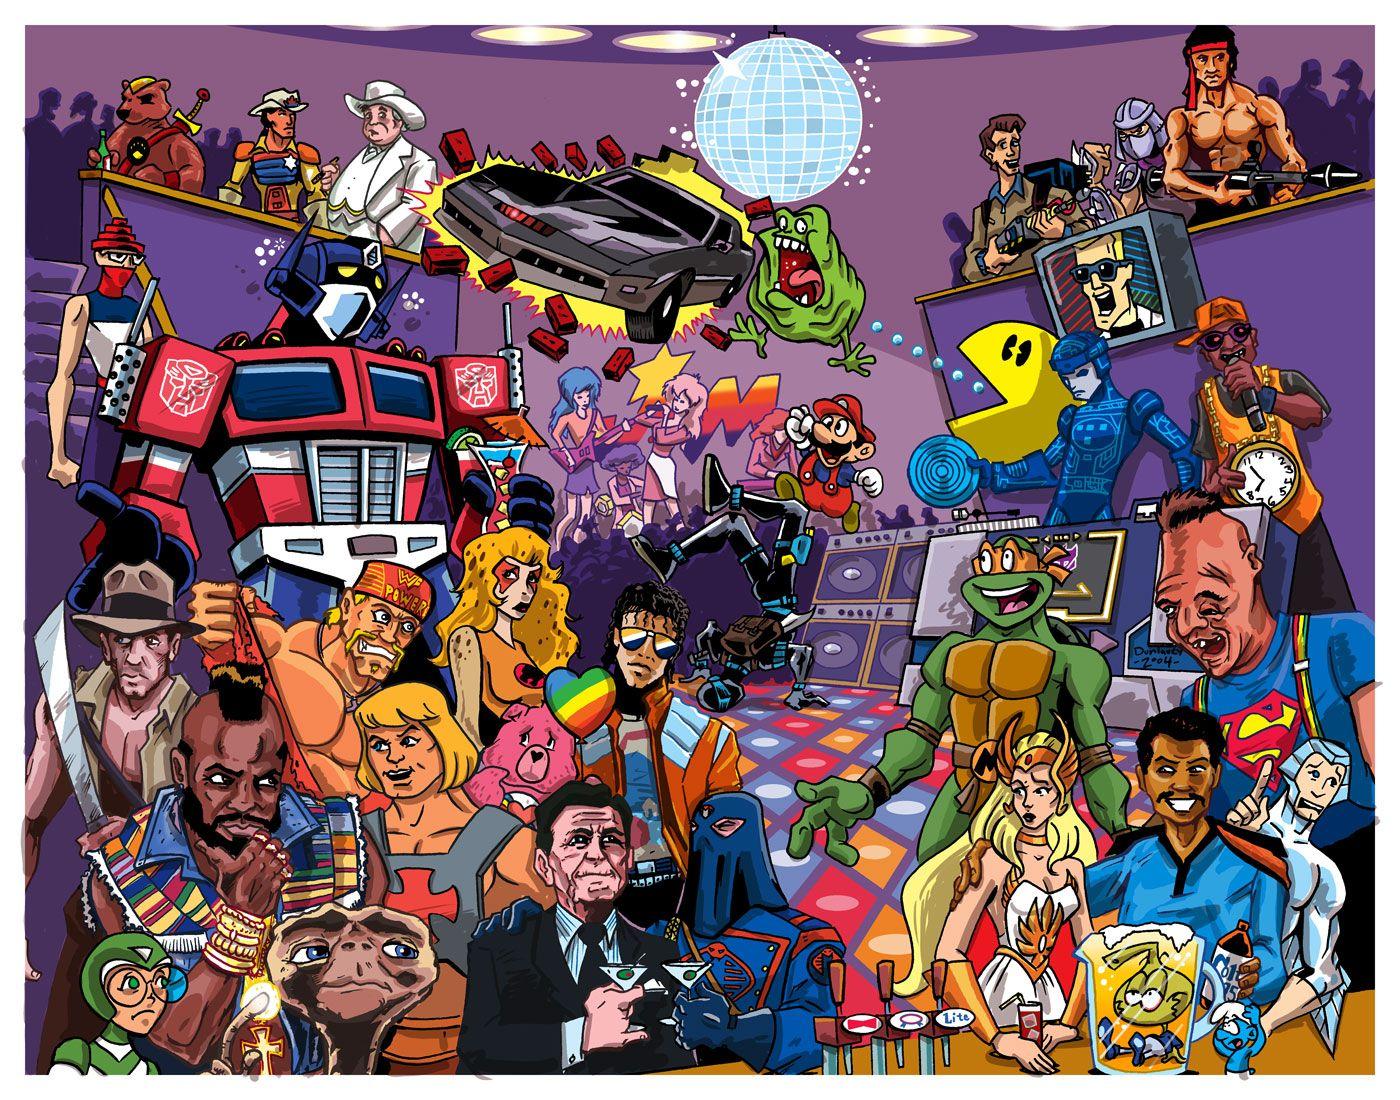 Cartoon Characters 80s 90s : Ryan dunlavey s cartoon character party awesomeness